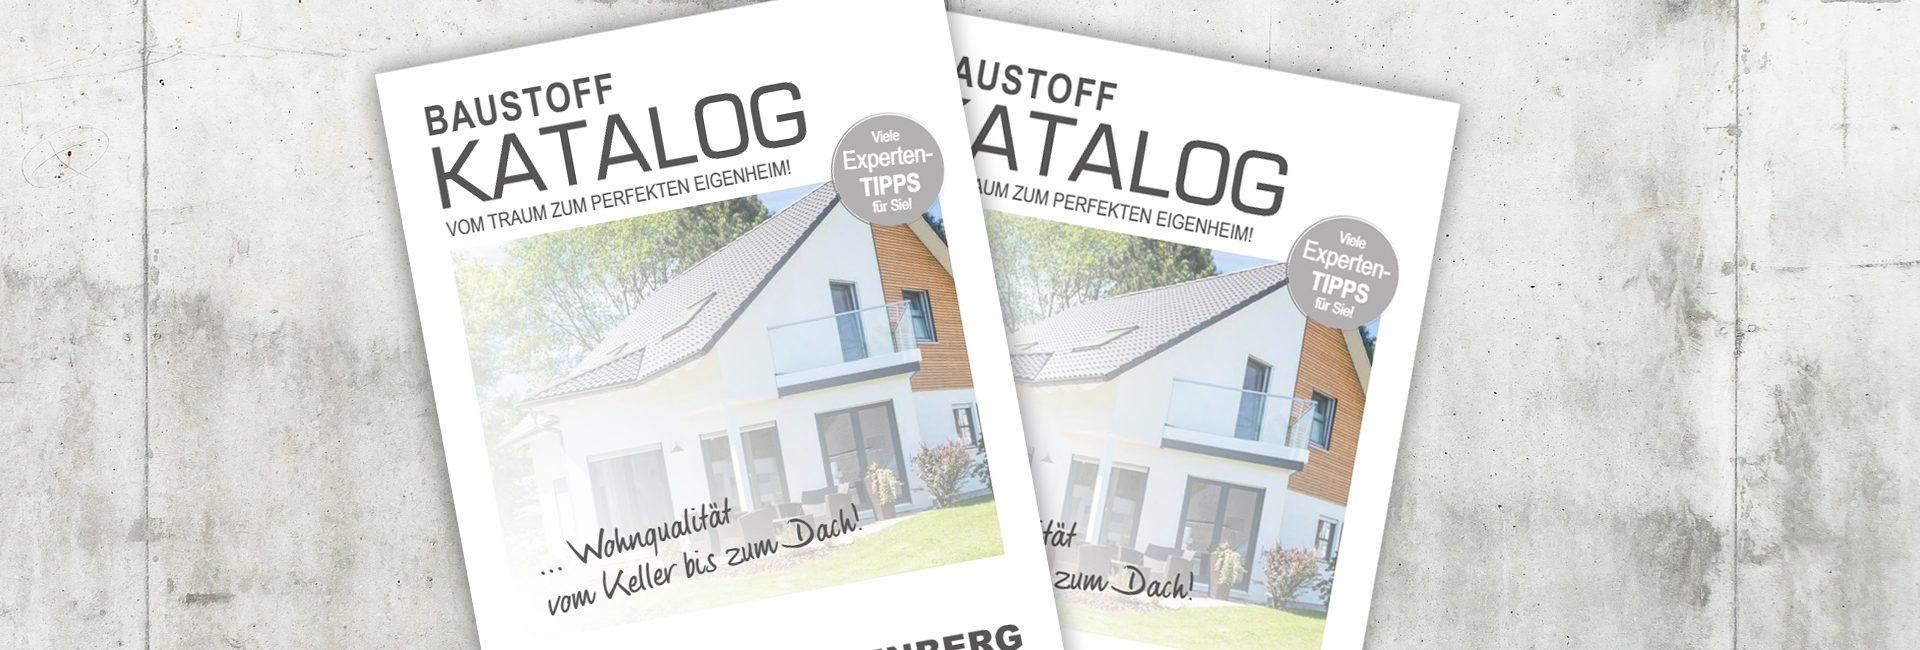 Baustoff-Katalog aus Spangenberg